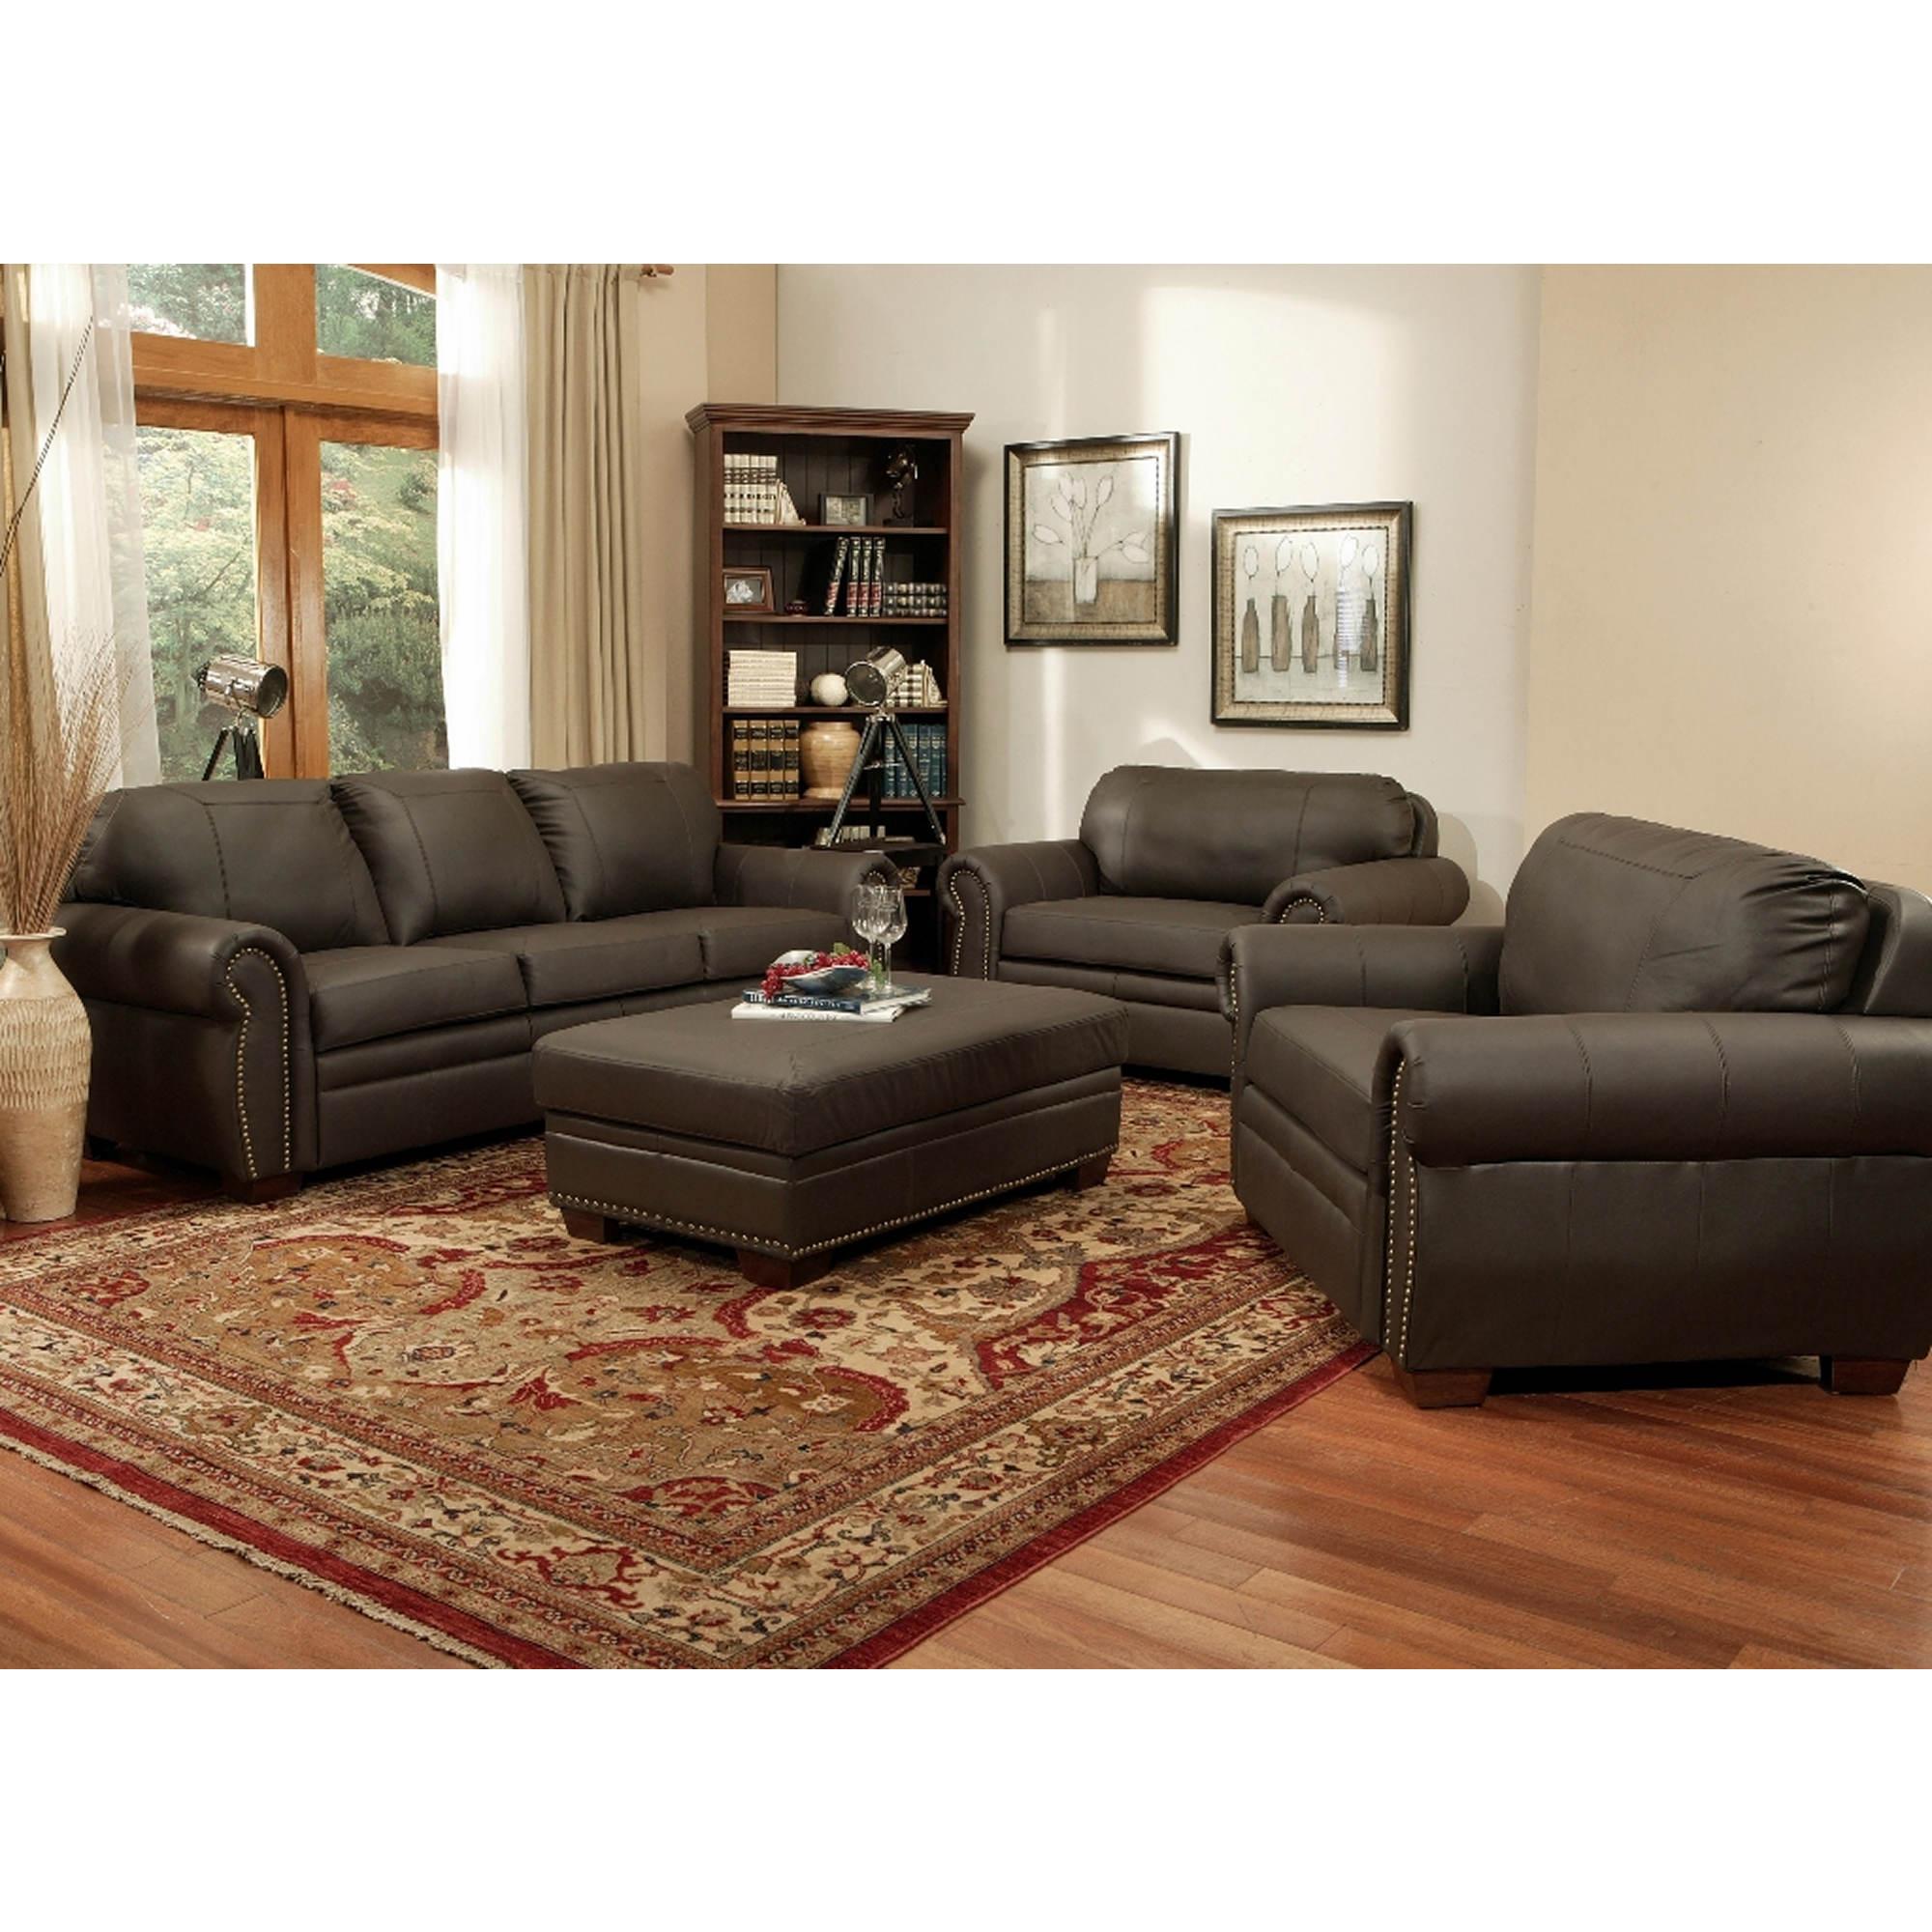 Abbyson Living Brownstone Leather 4 Pc Furniture Set Dark Brown Bj 39 S Wholesale Club